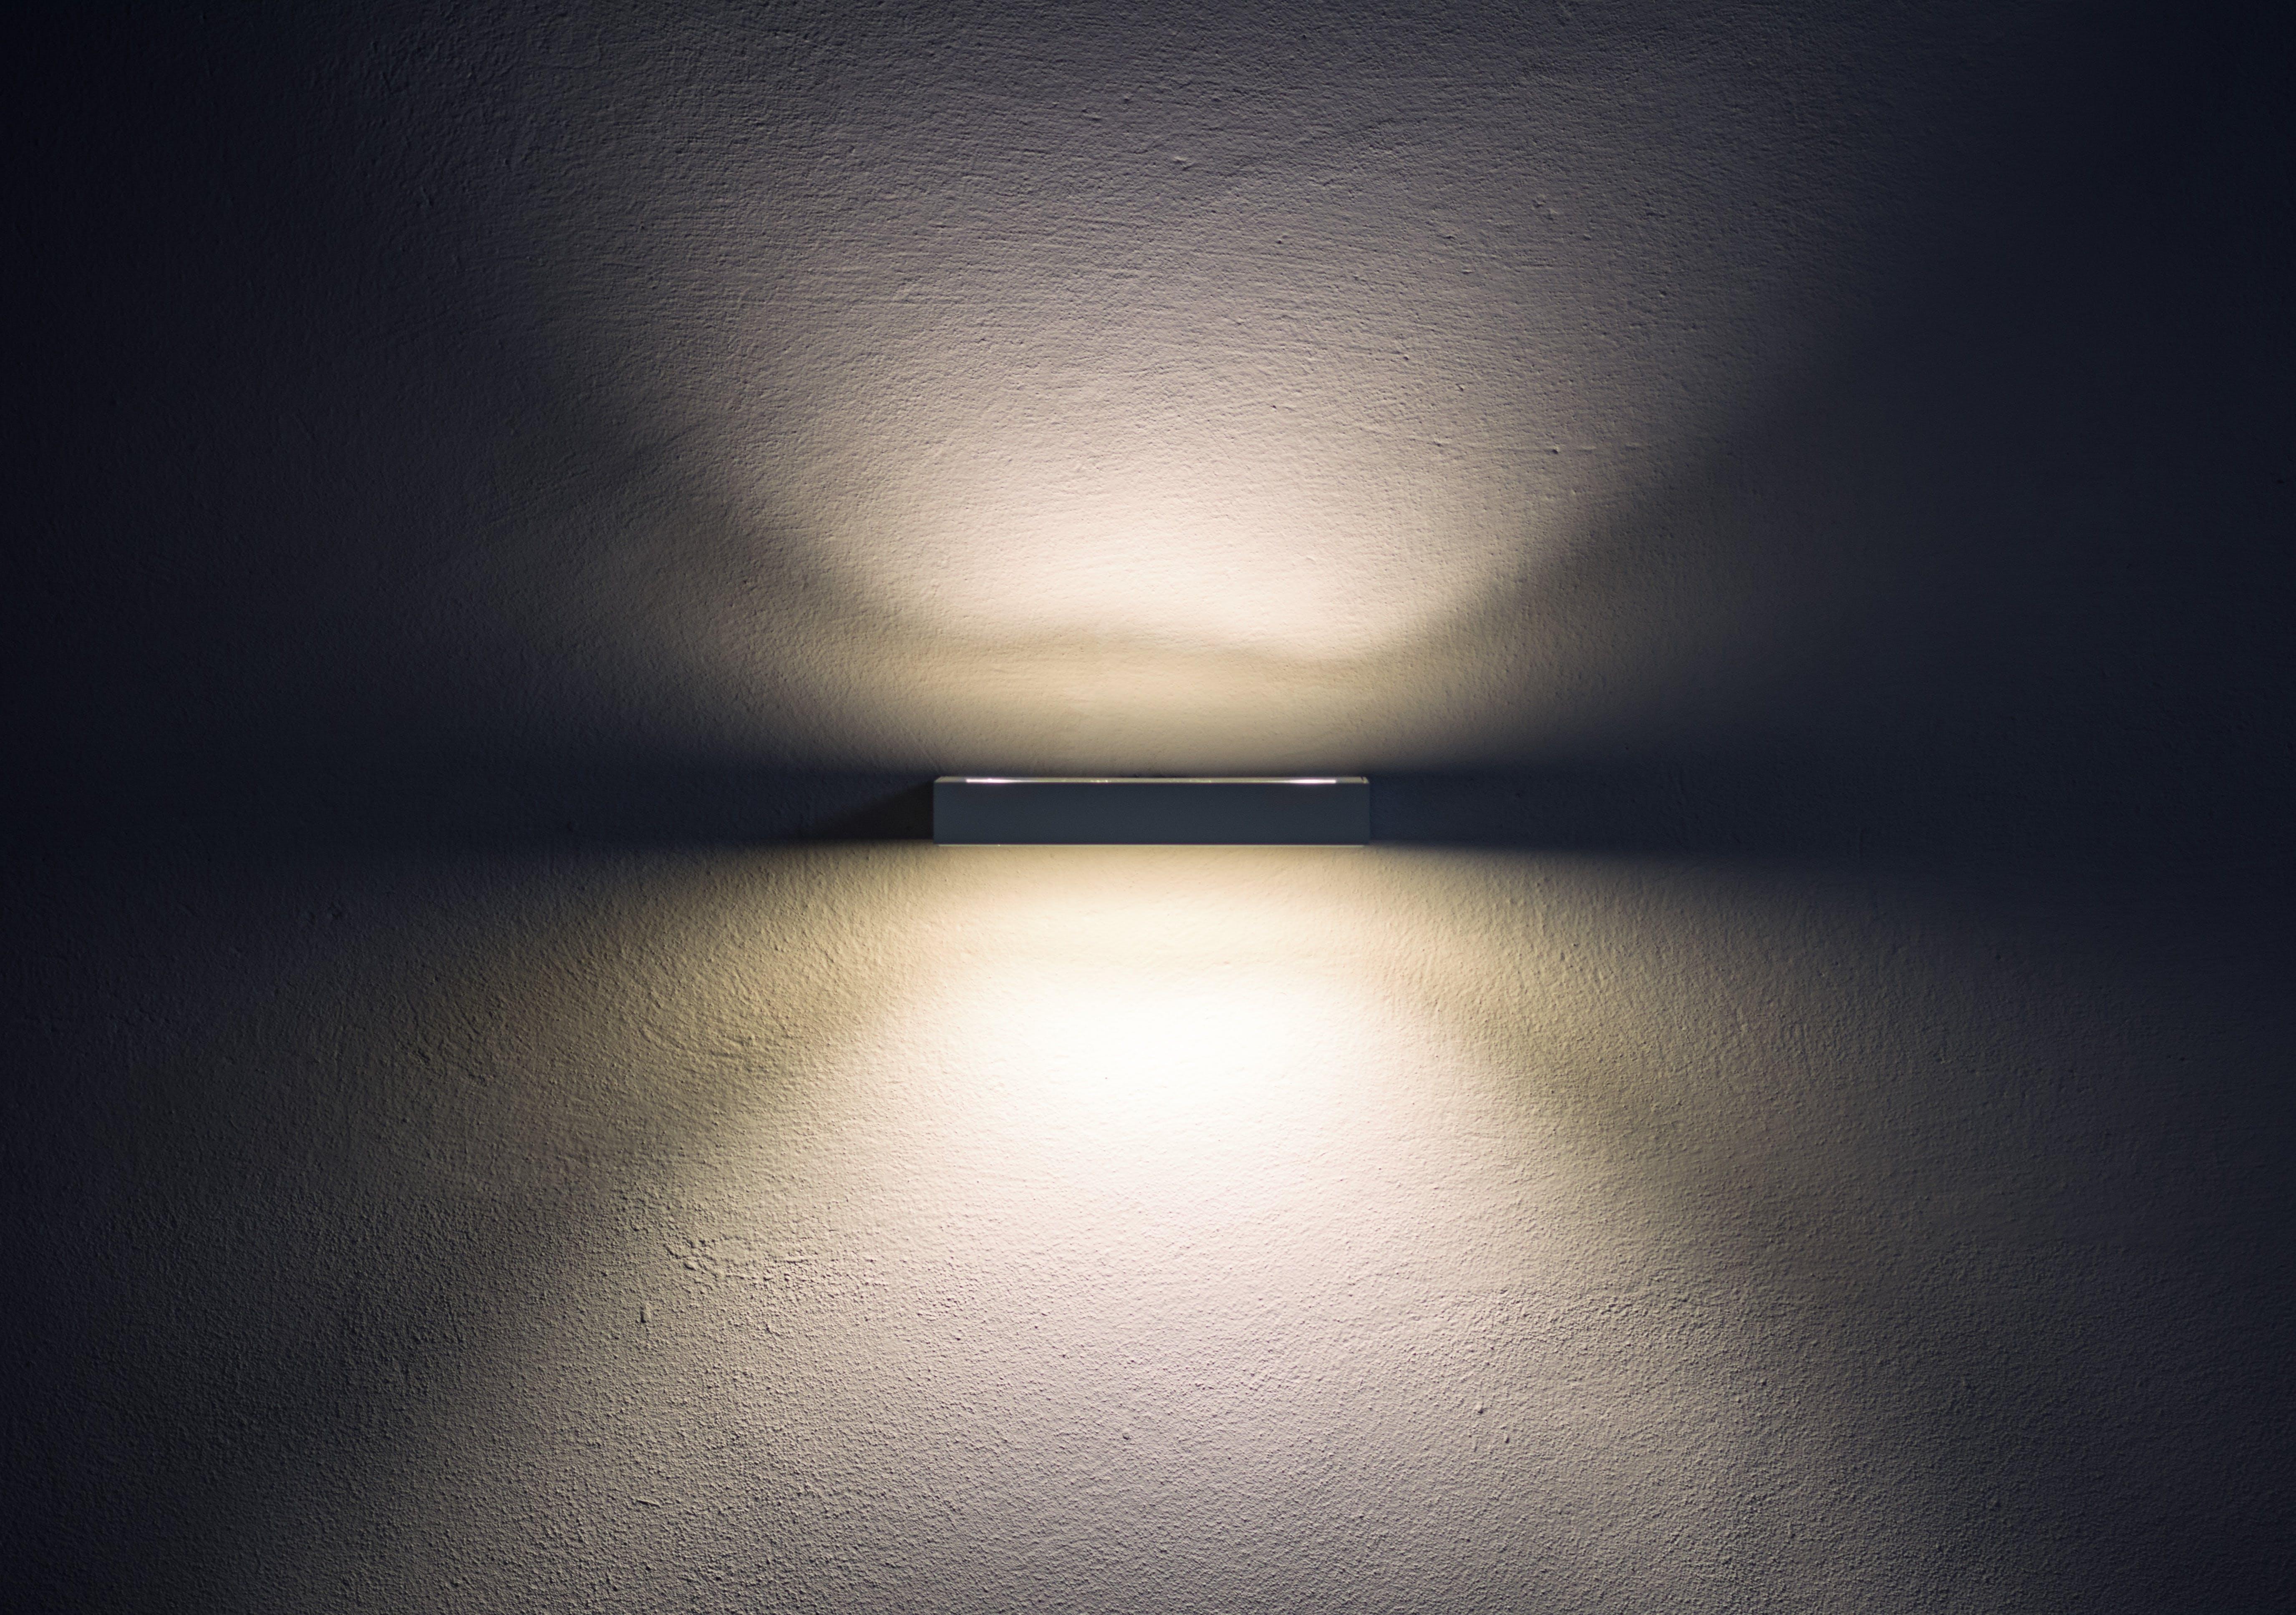 Free stock photo of light, dark, lamp, ceiling